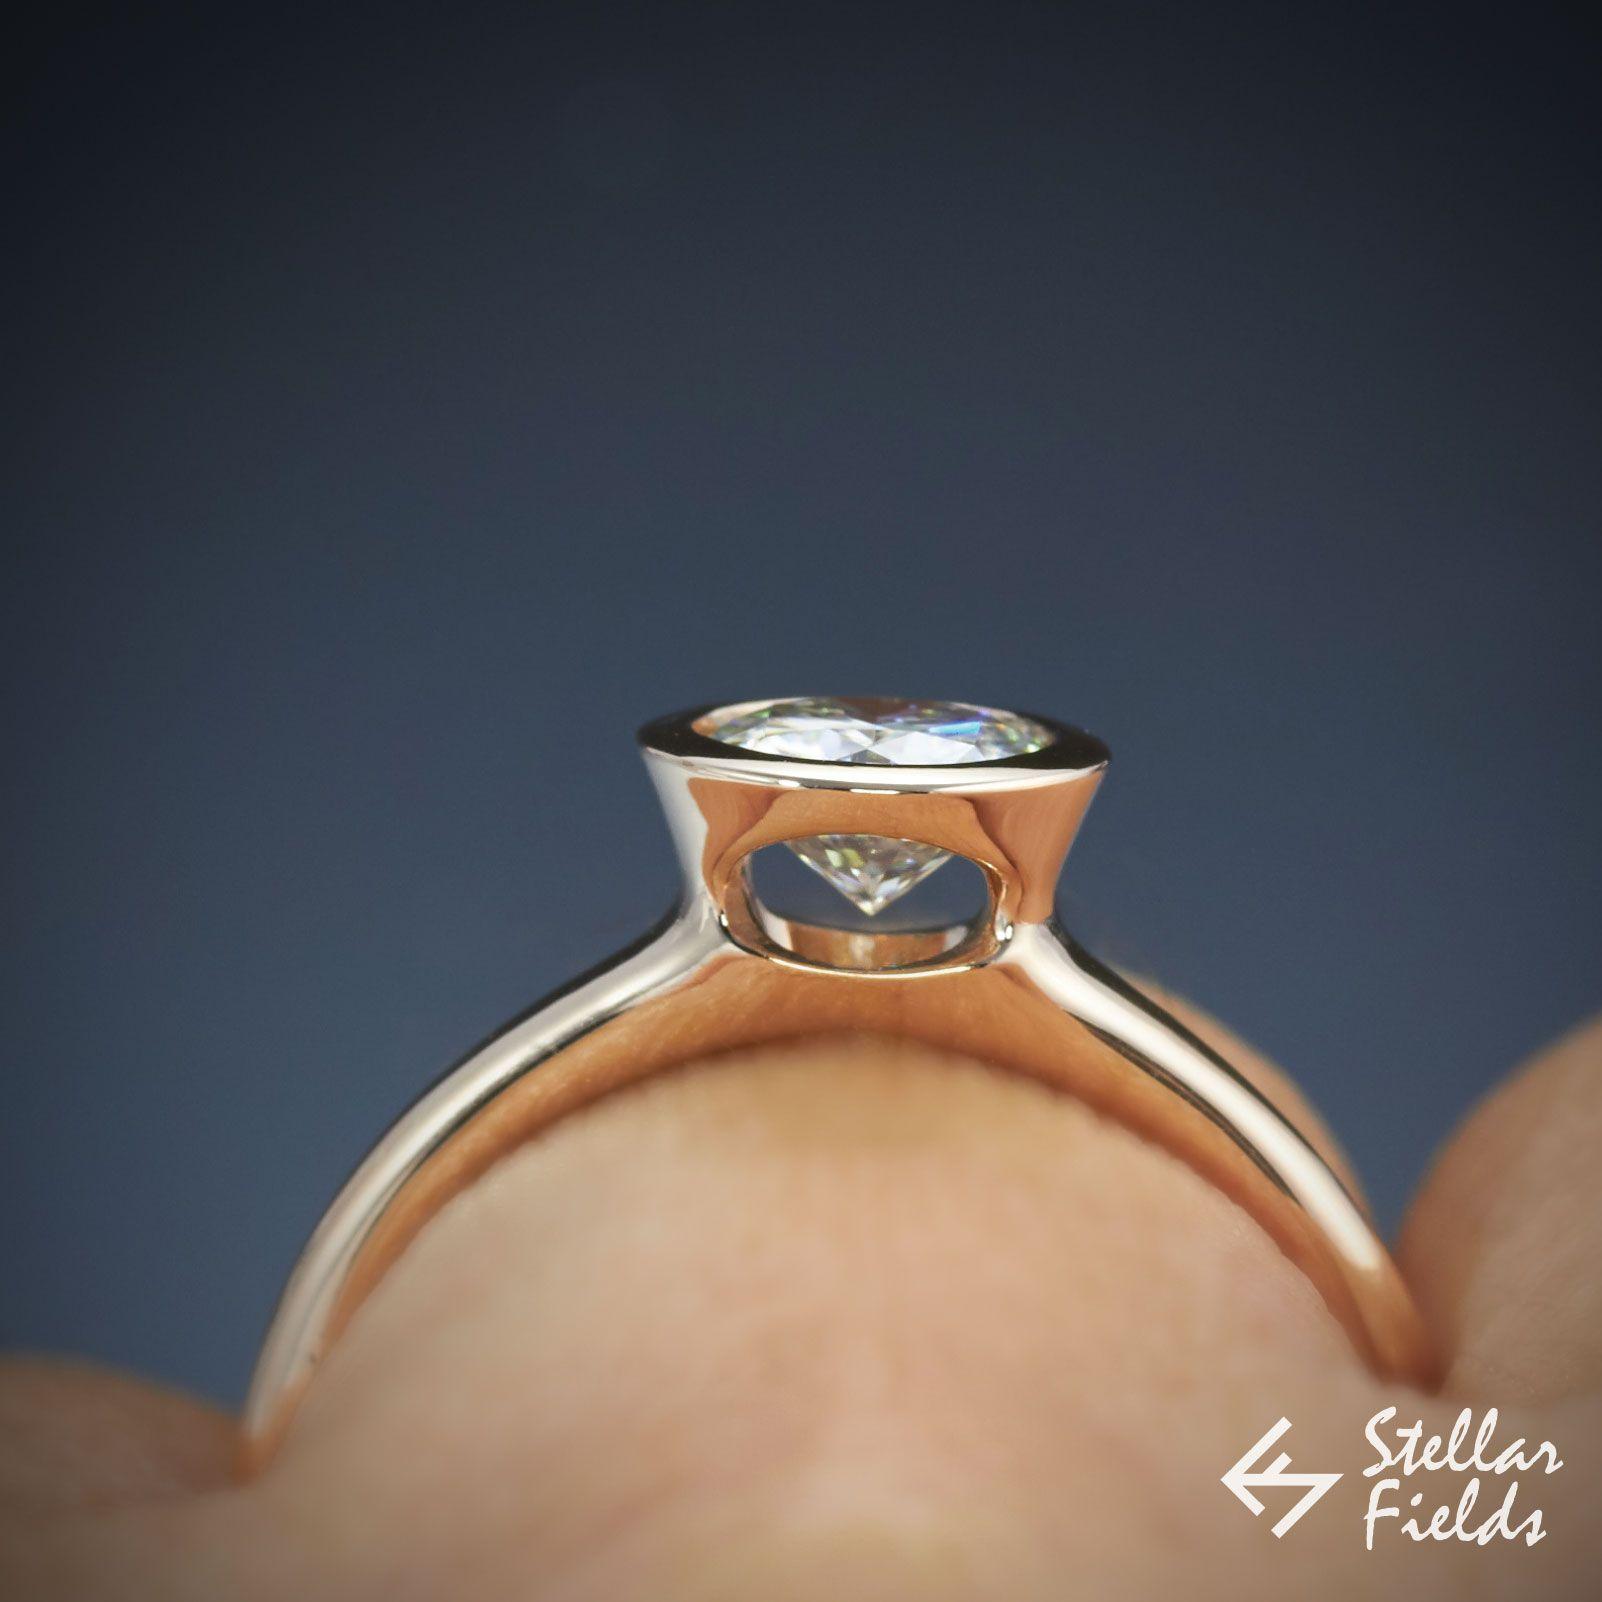 fe94dcc71cf17 Peekaboo Bezel Engagement Ring - 1ct 6.5mm Forever Brilliant ...